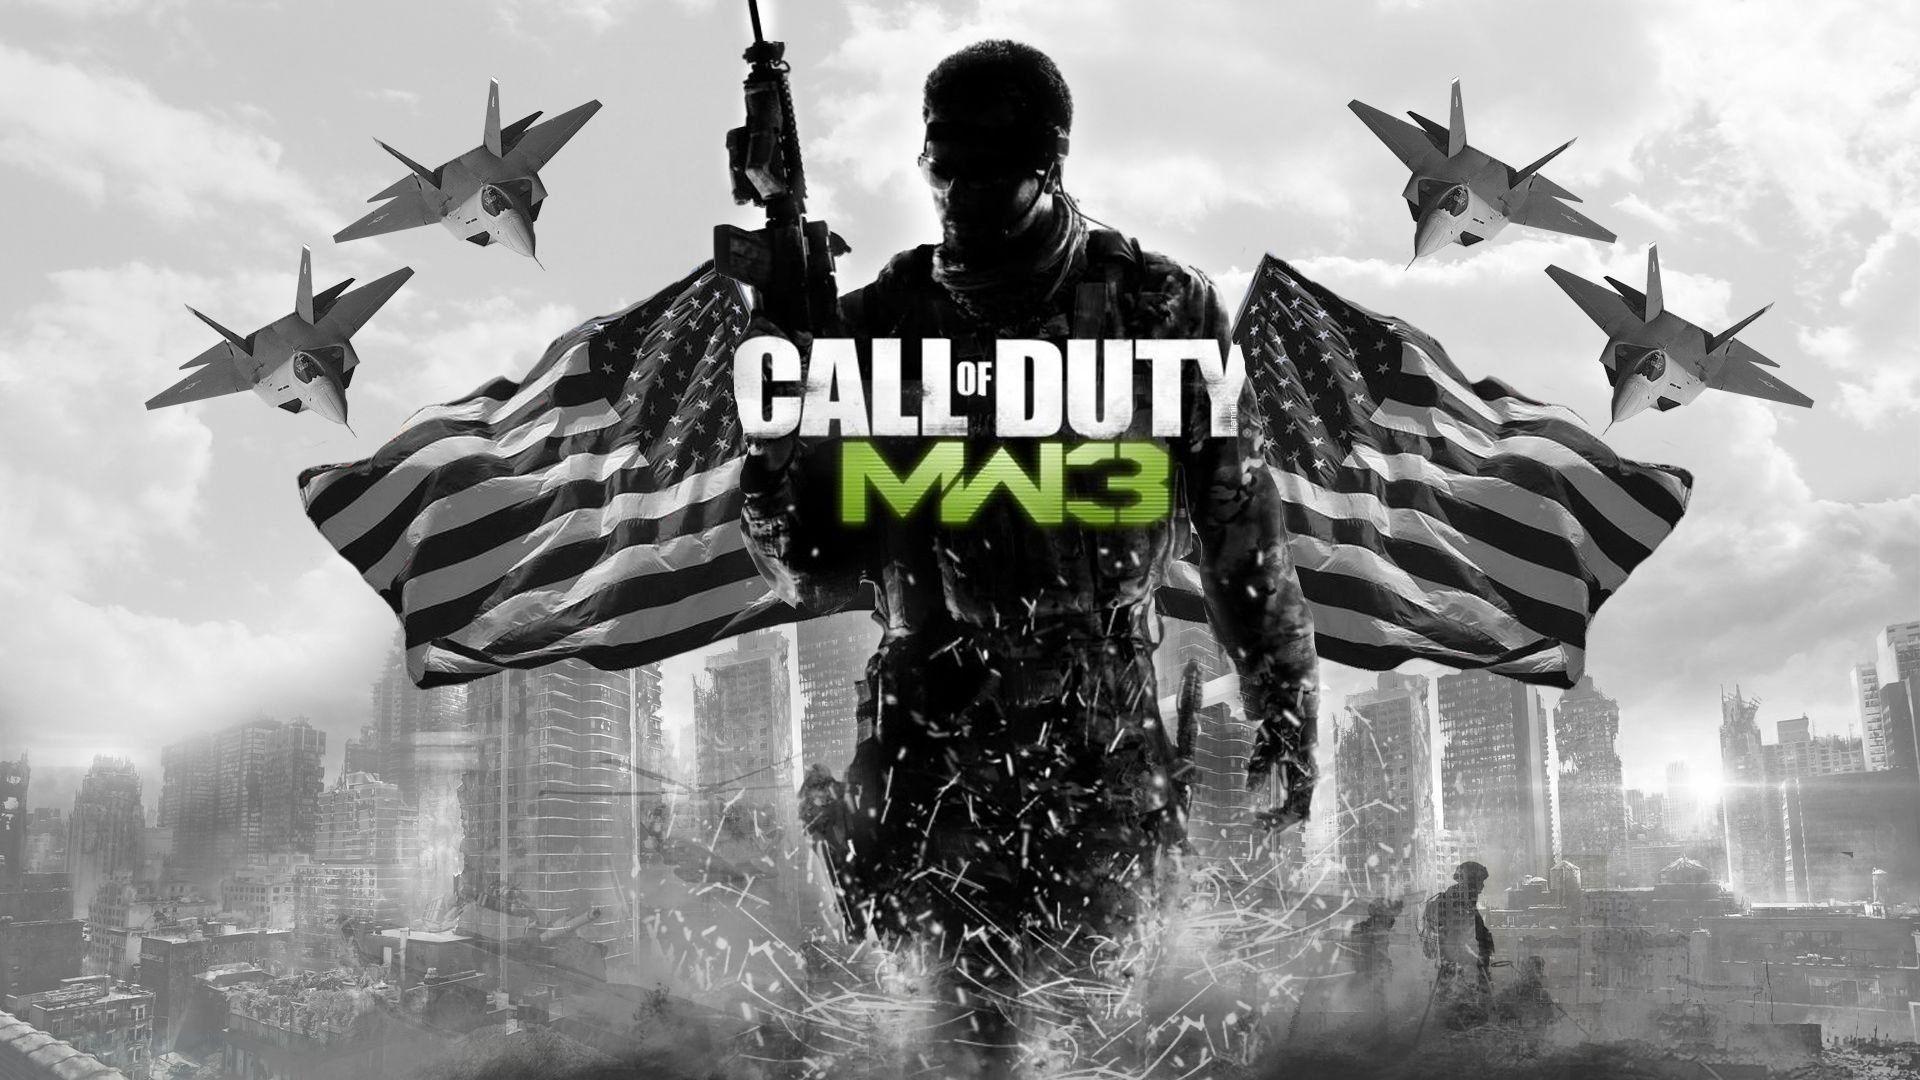 Call Of Duty Modern Warfare 3 Call Of Duty Modern Warfare Call Of Duty Black